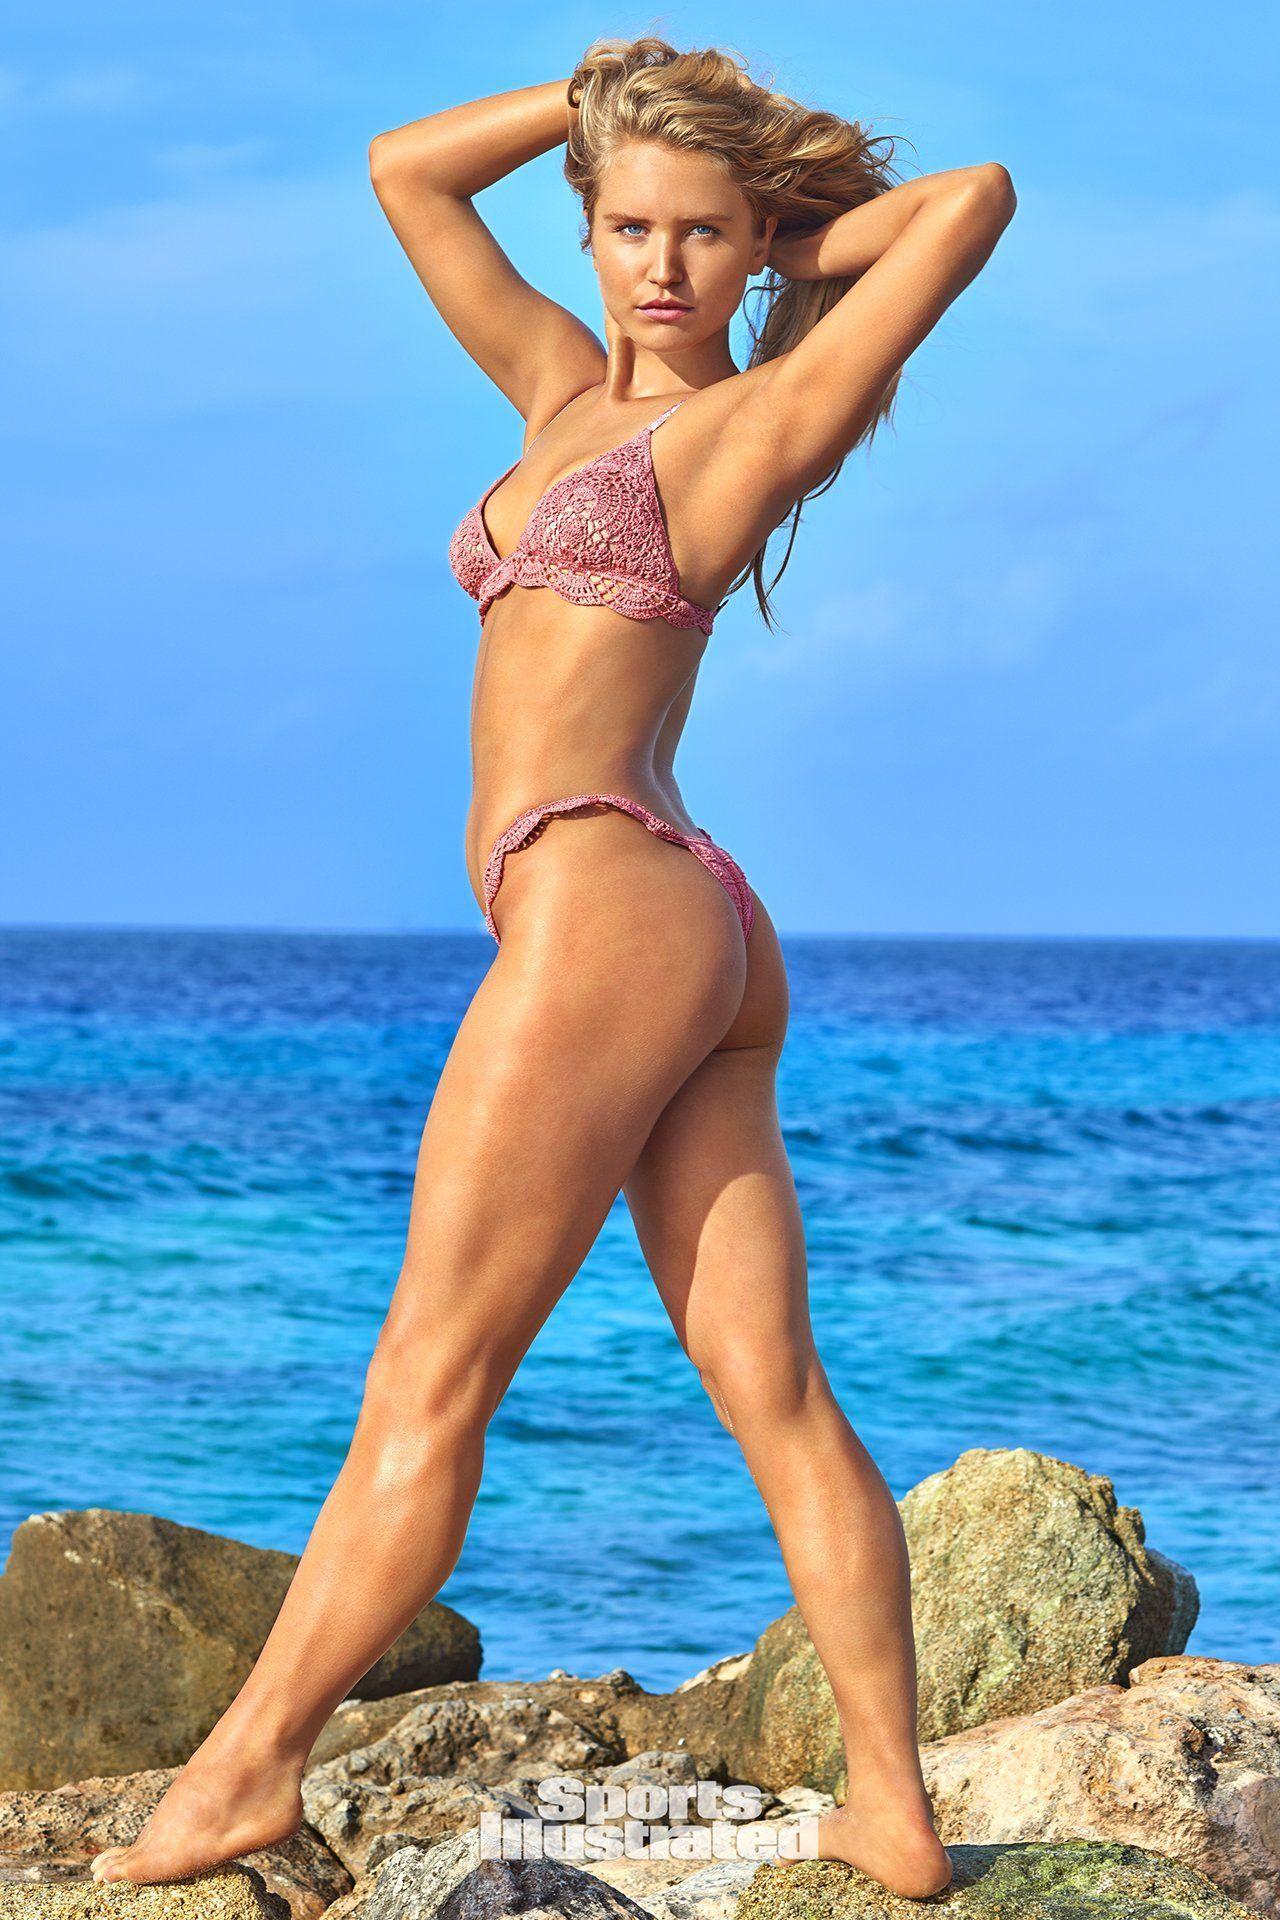 Hot Sailor Brinkley nudes (35 photos), Tits, Is a cute, Feet, legs 2018